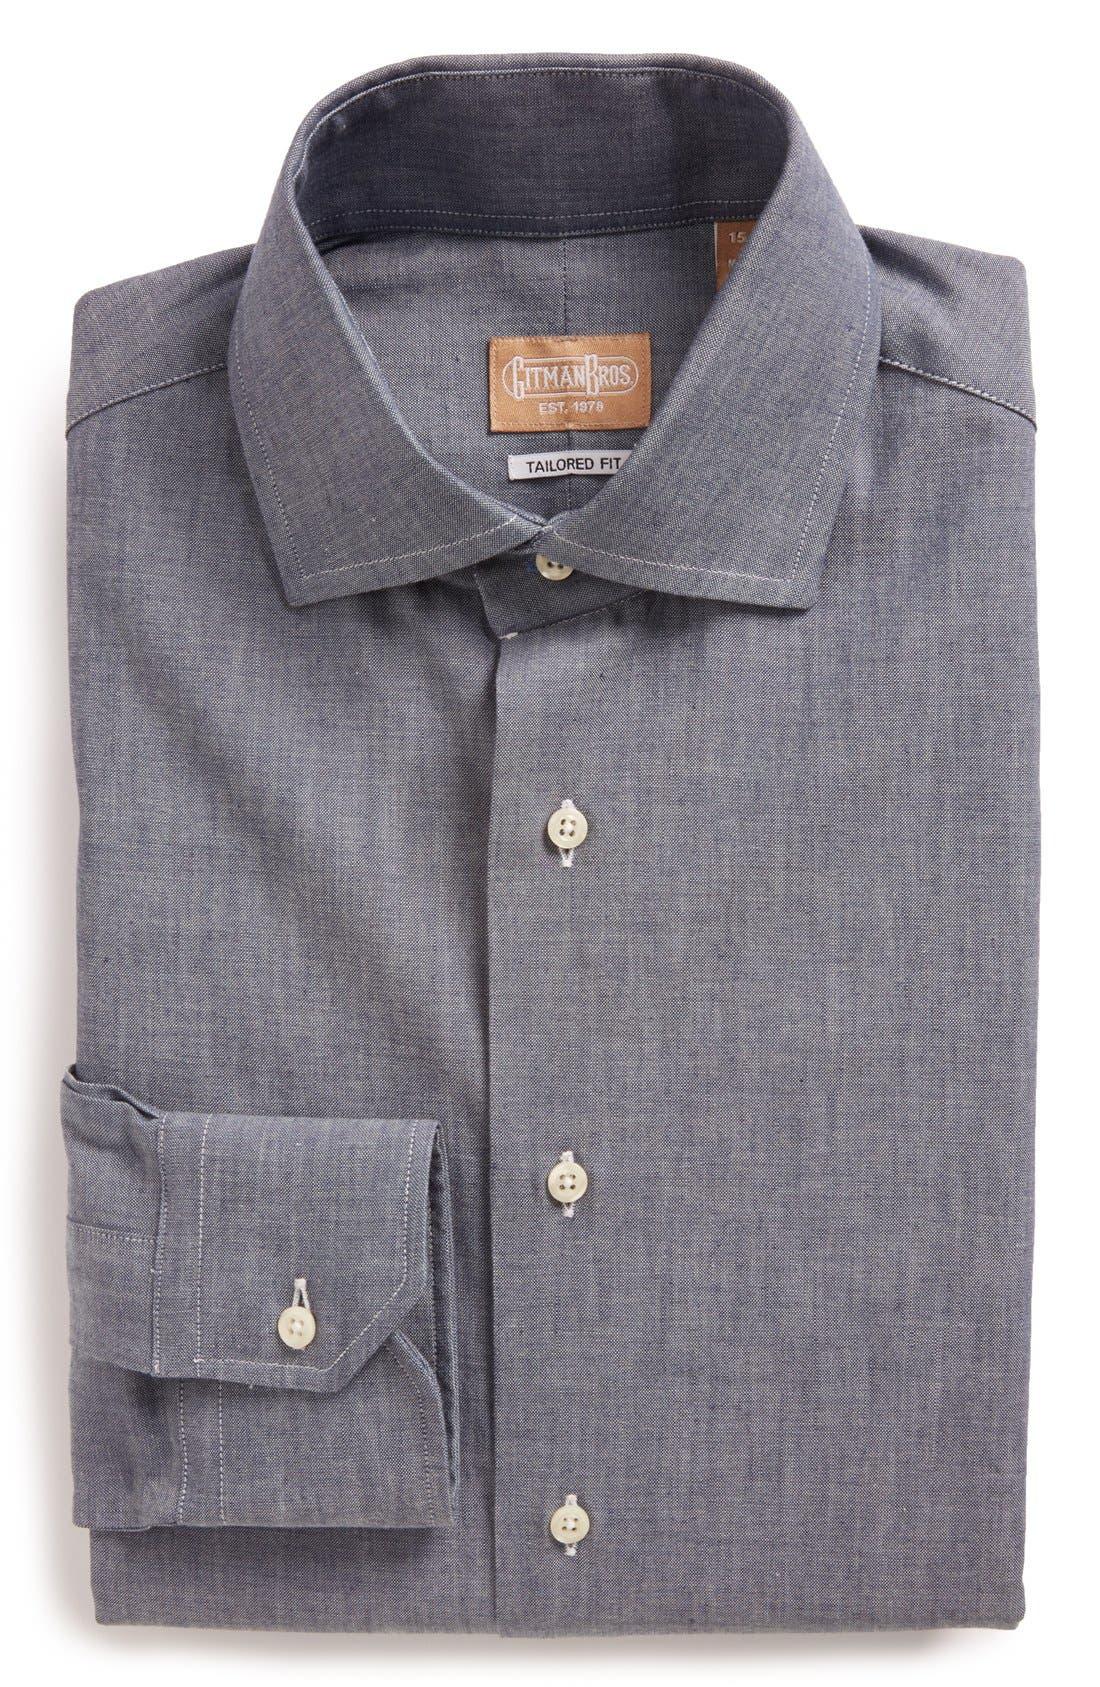 Alternate Image 1 Selected - Gitman Tailored Fit Chambray Dress Shirt